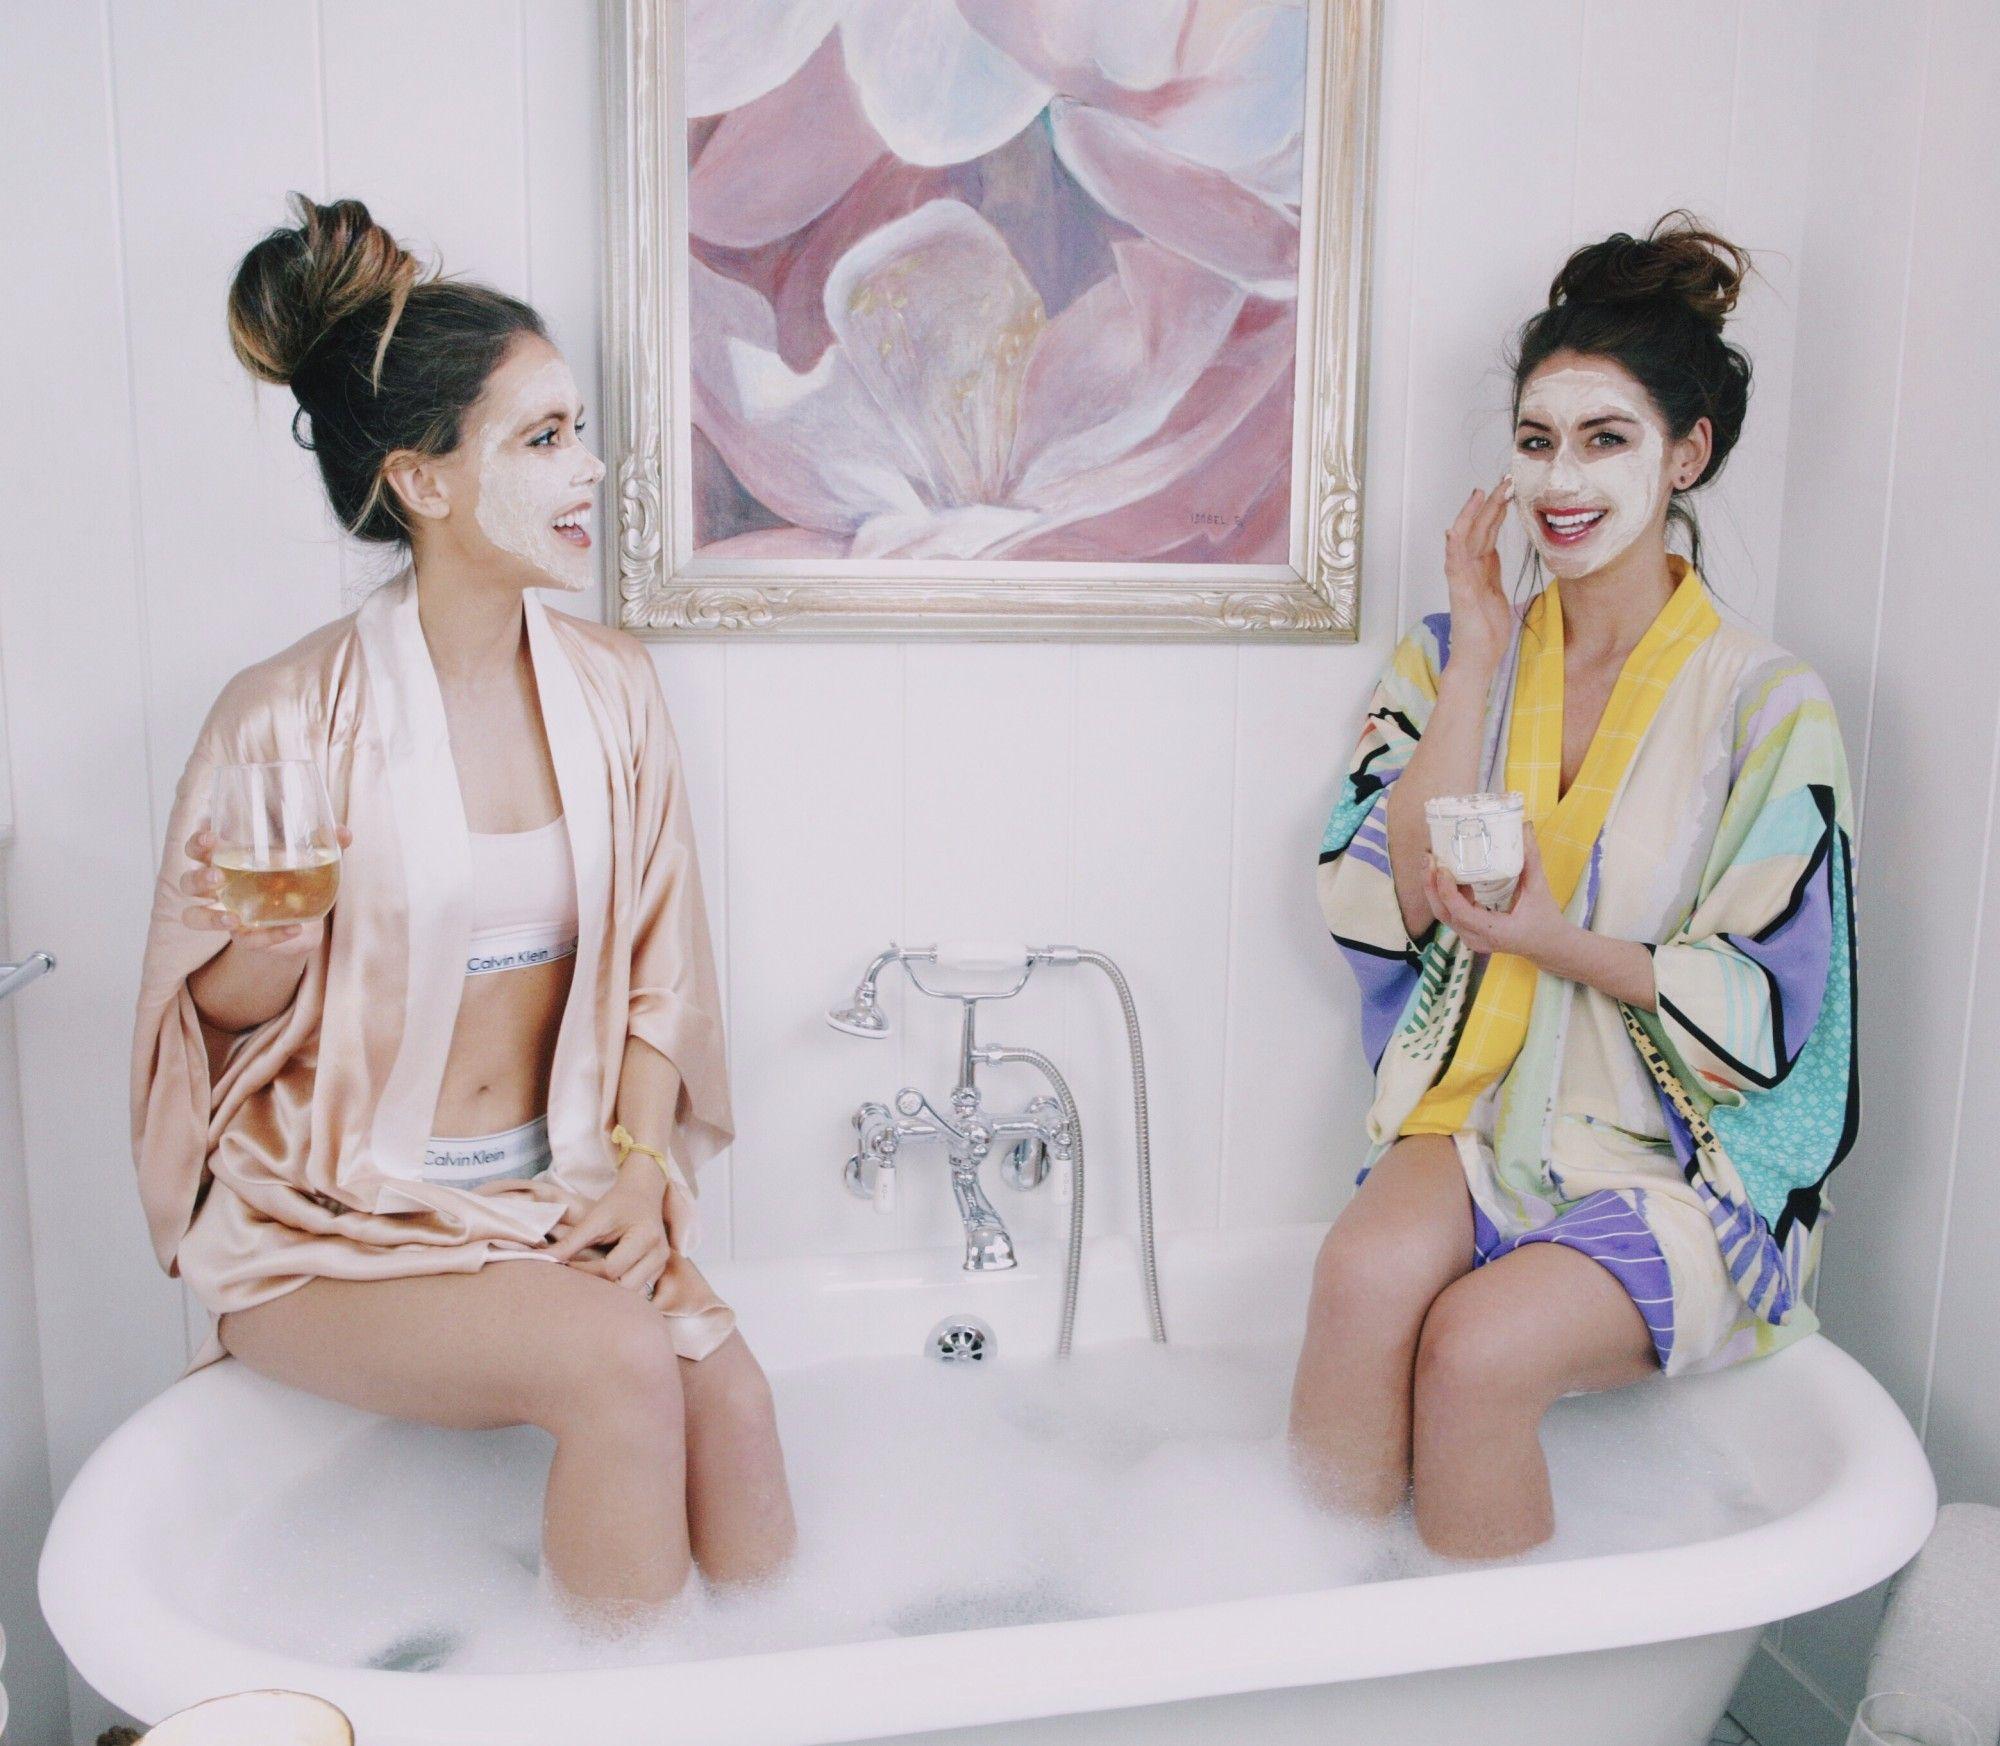 At Home Spa Day With K&K... & DIY Face Masks! | Diy face mask, Spa ...